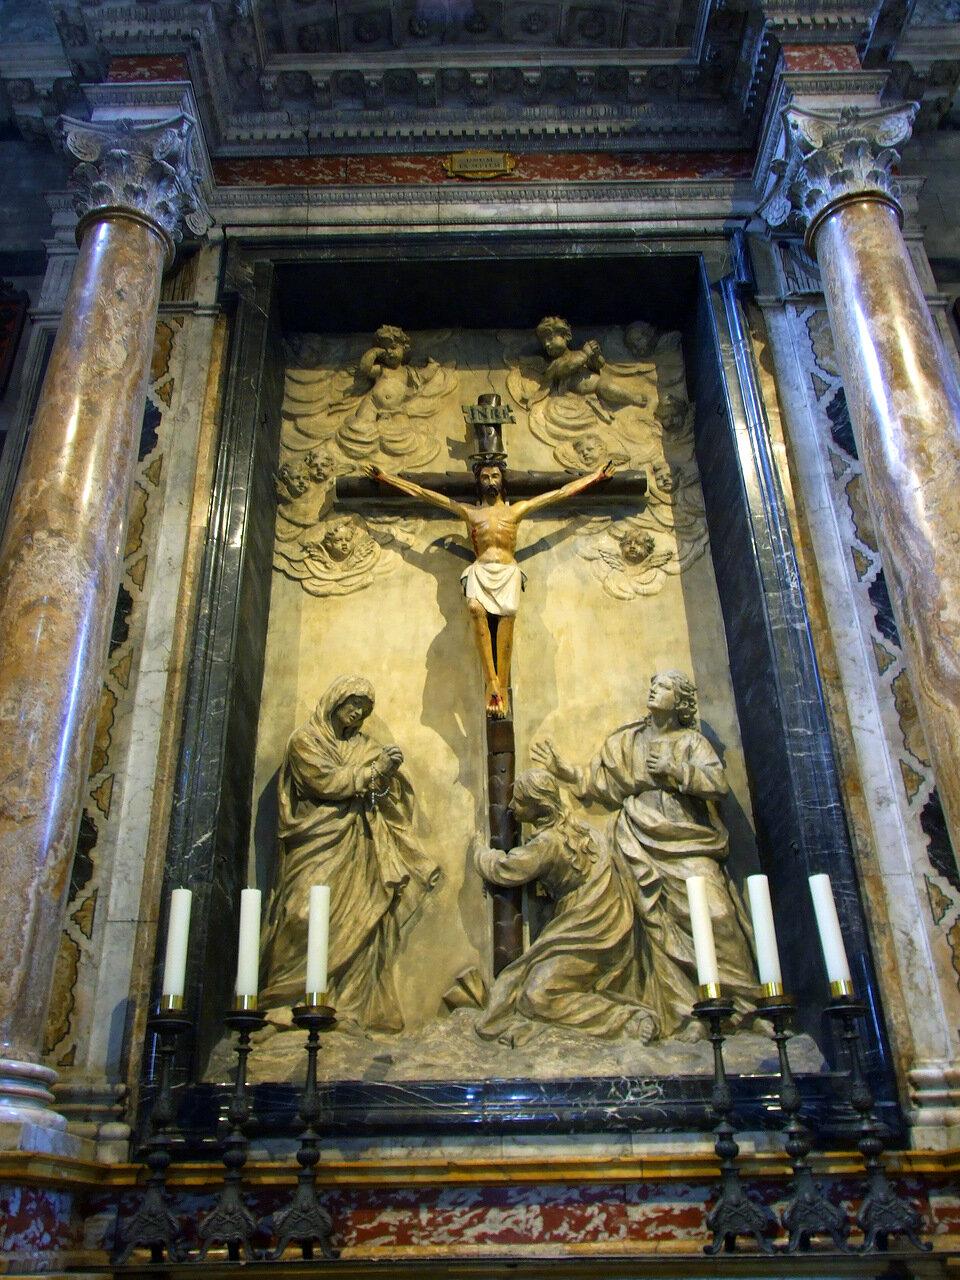 Внутри Кафедрального Собора (Сattedrale di Santa Maria Assunta; Duomo di Siena)